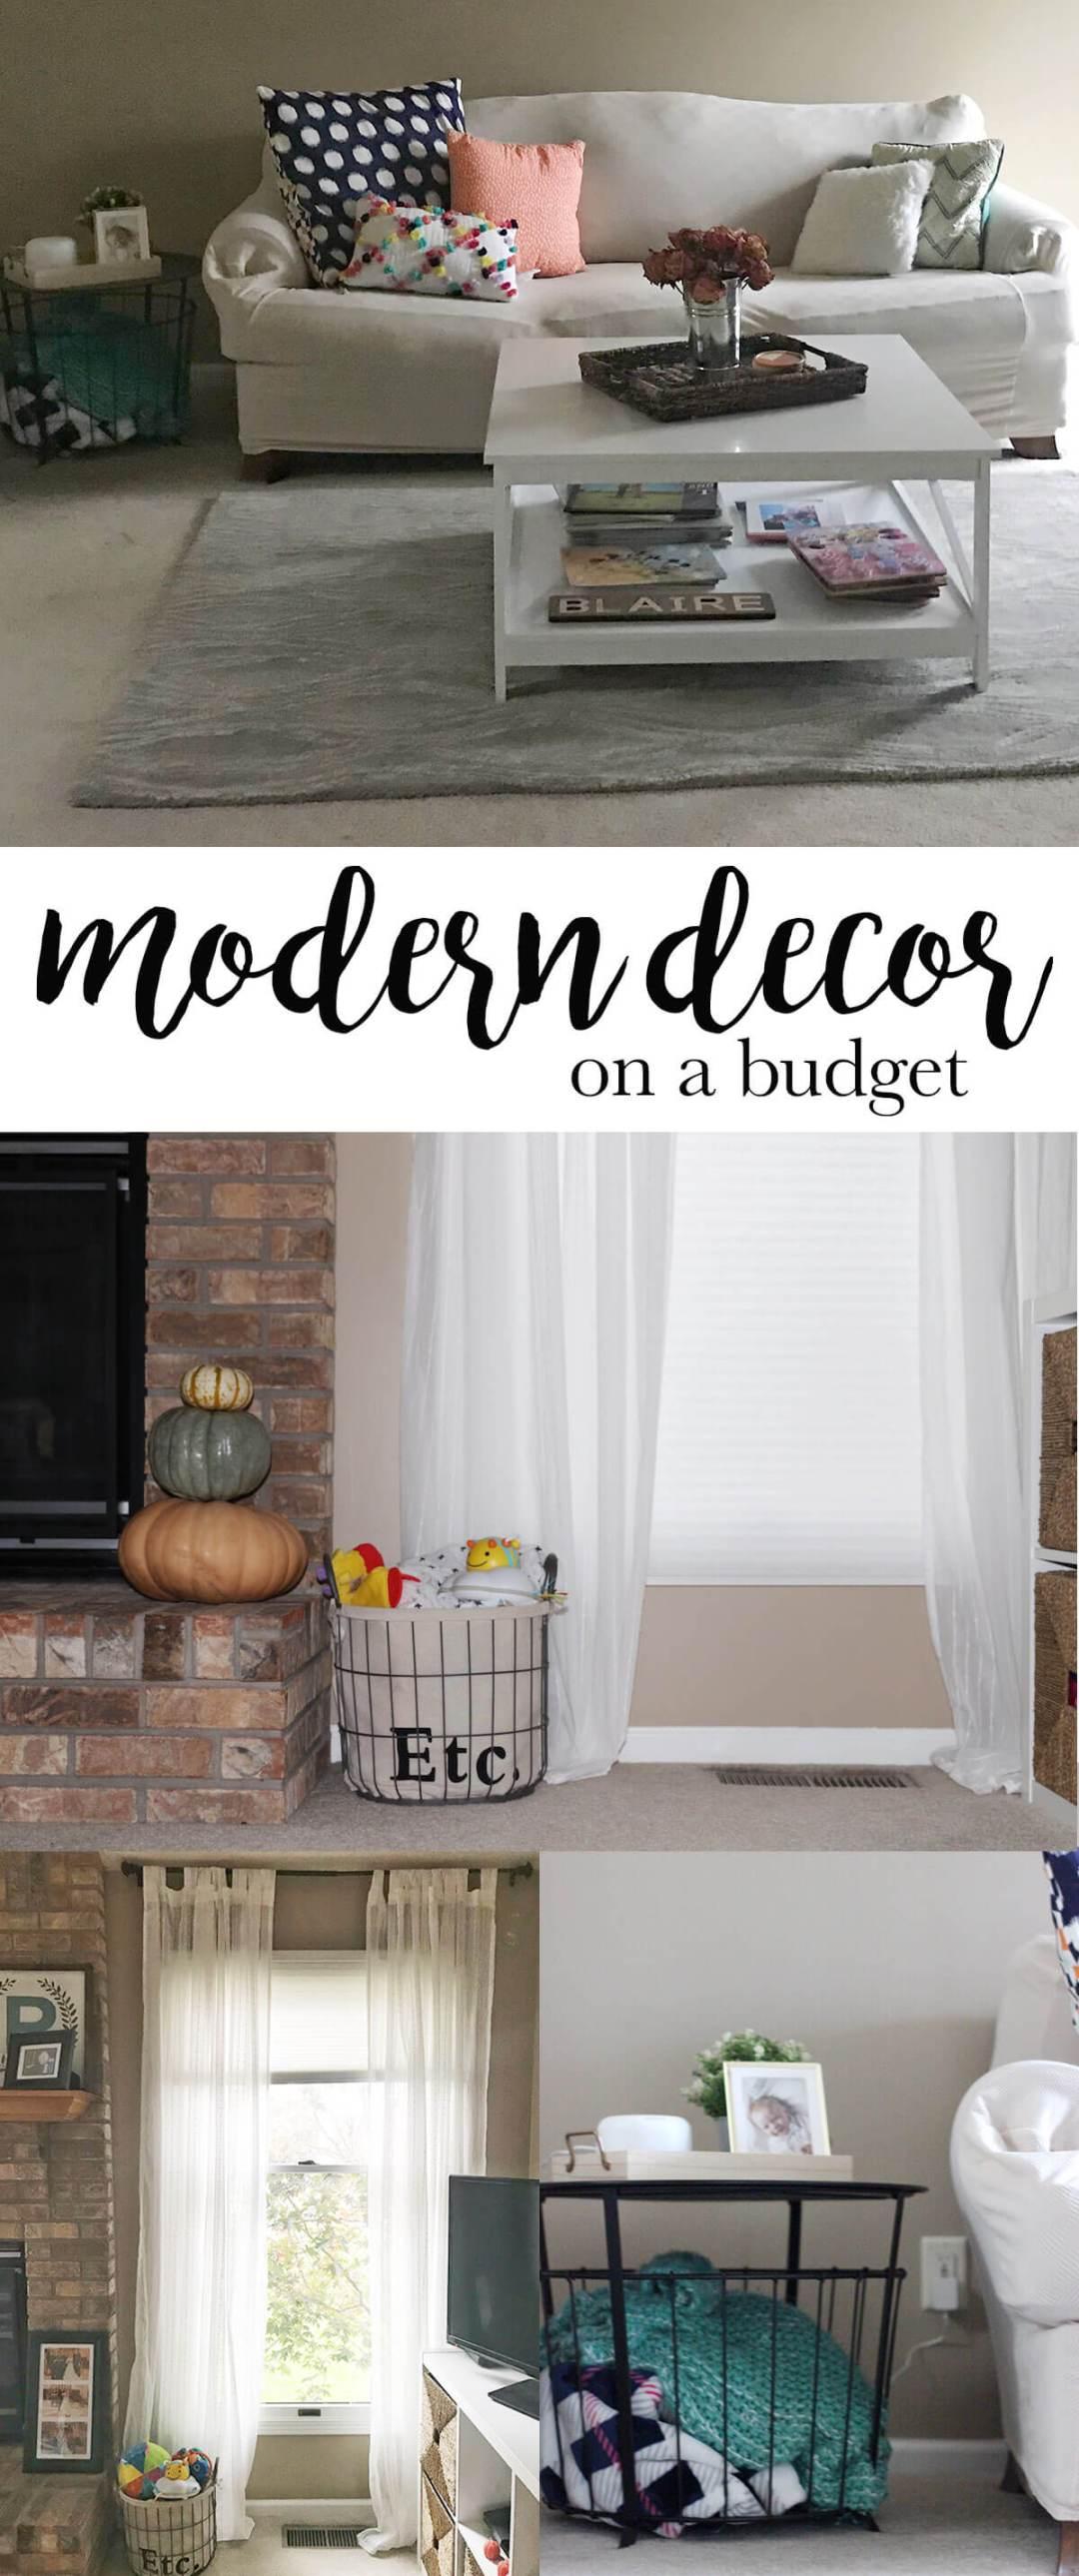 modern decor on a budget | Shopaholic & a Baby blog